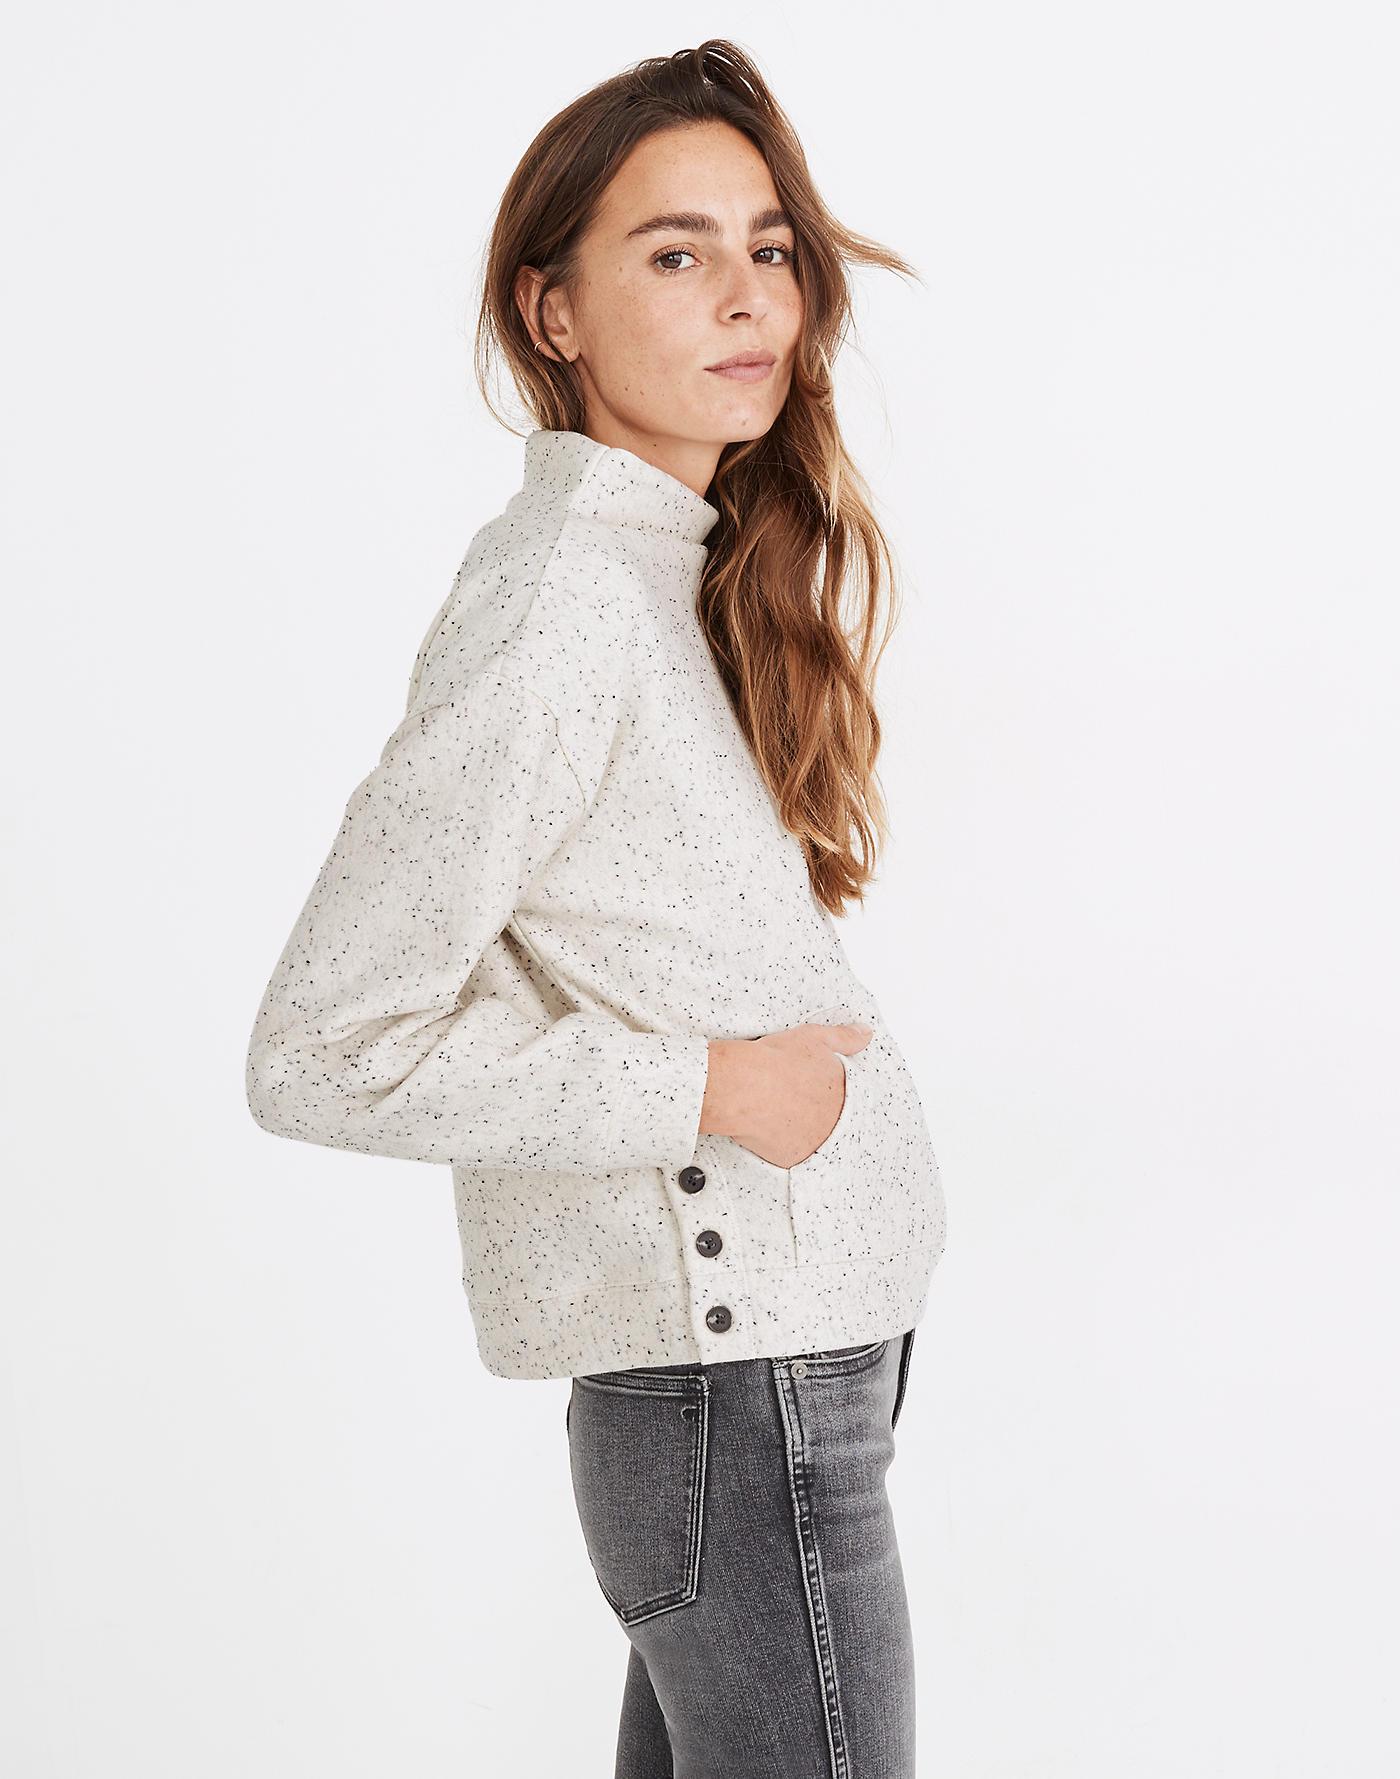 Donegal Mockneck Side-Button Sweatshirt